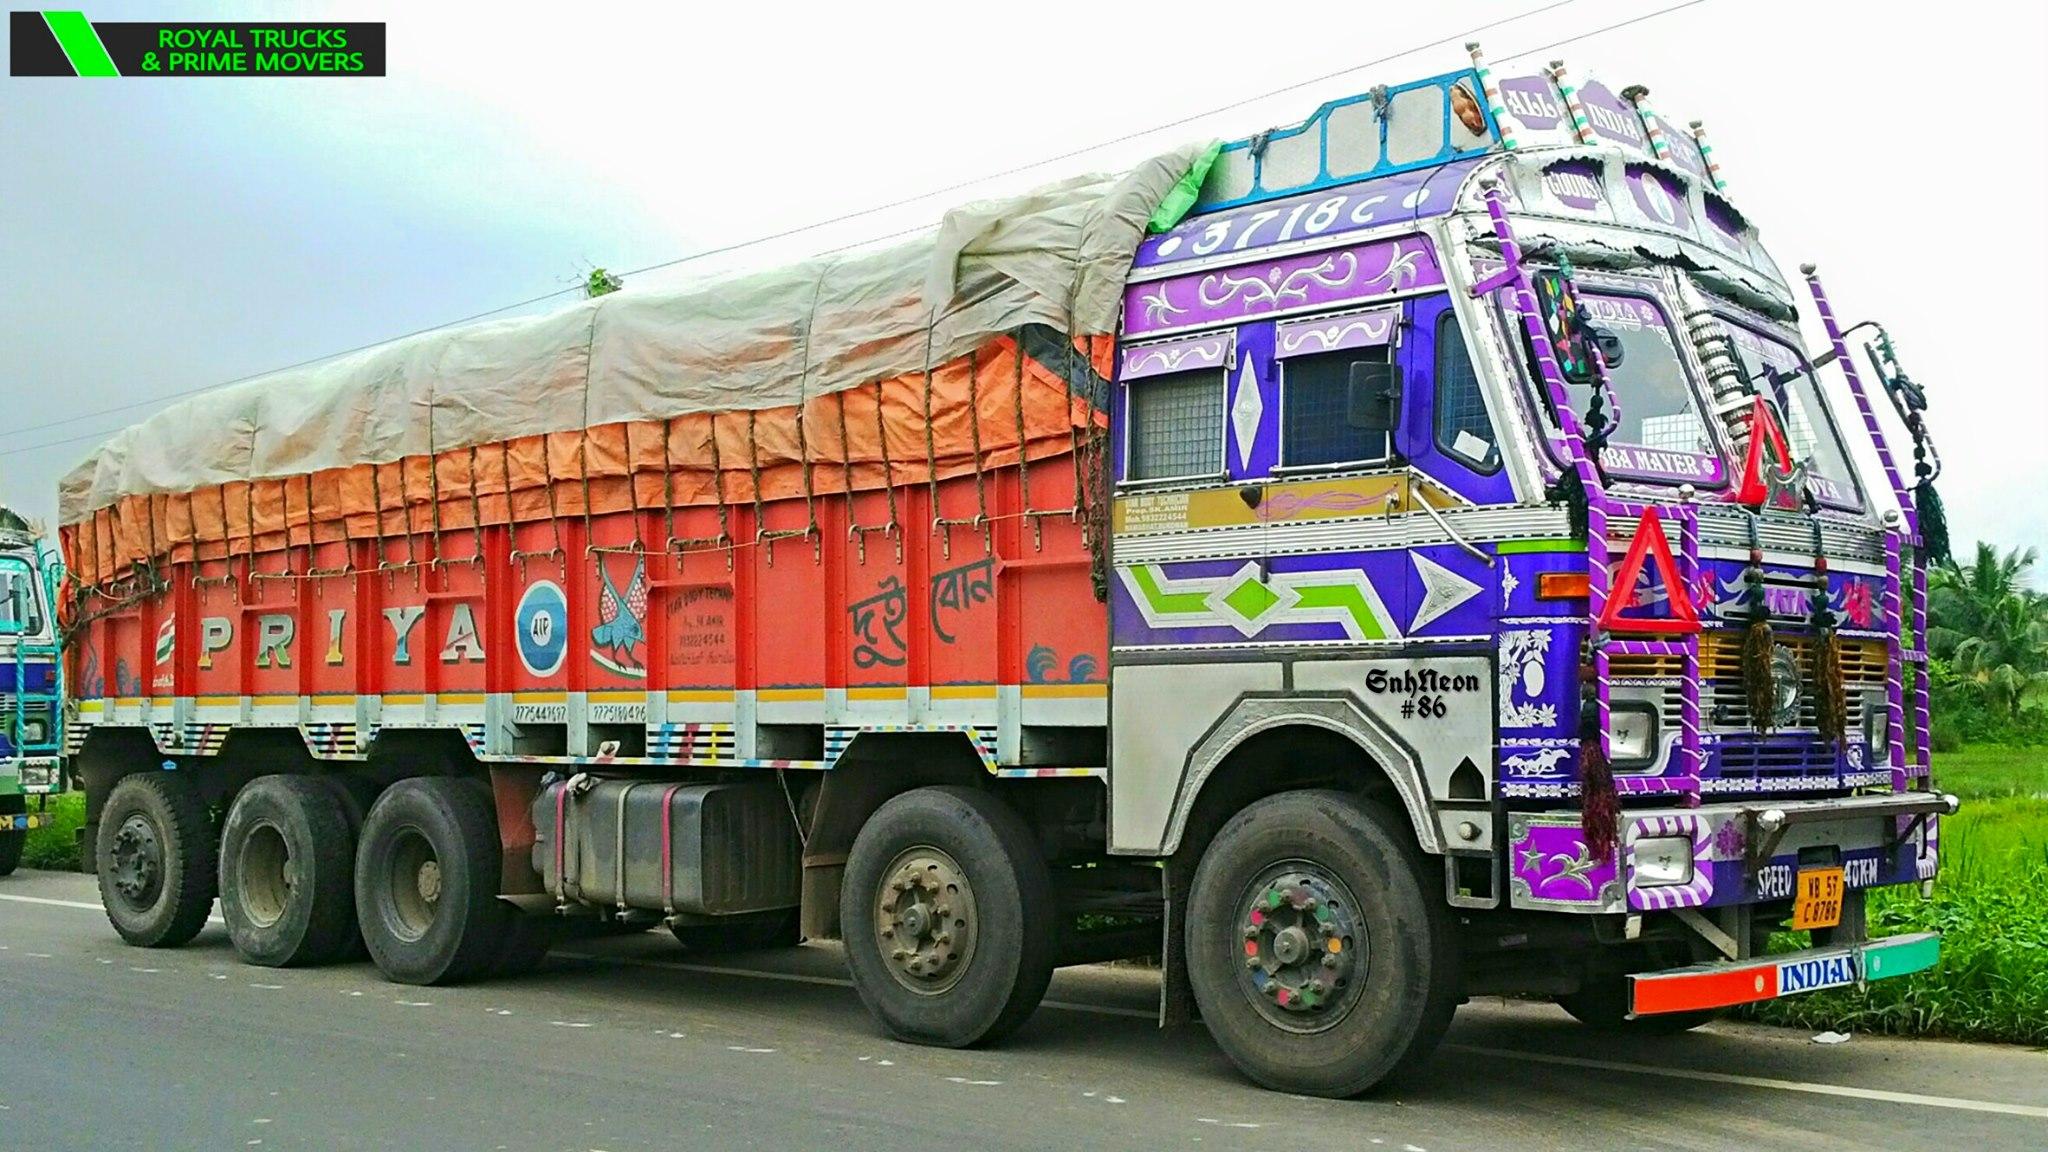 Tata-3718c-CHAMPADANGA-DANKUNI-ROAD--HOOGHLY--WEST-BENGAL--INDIA